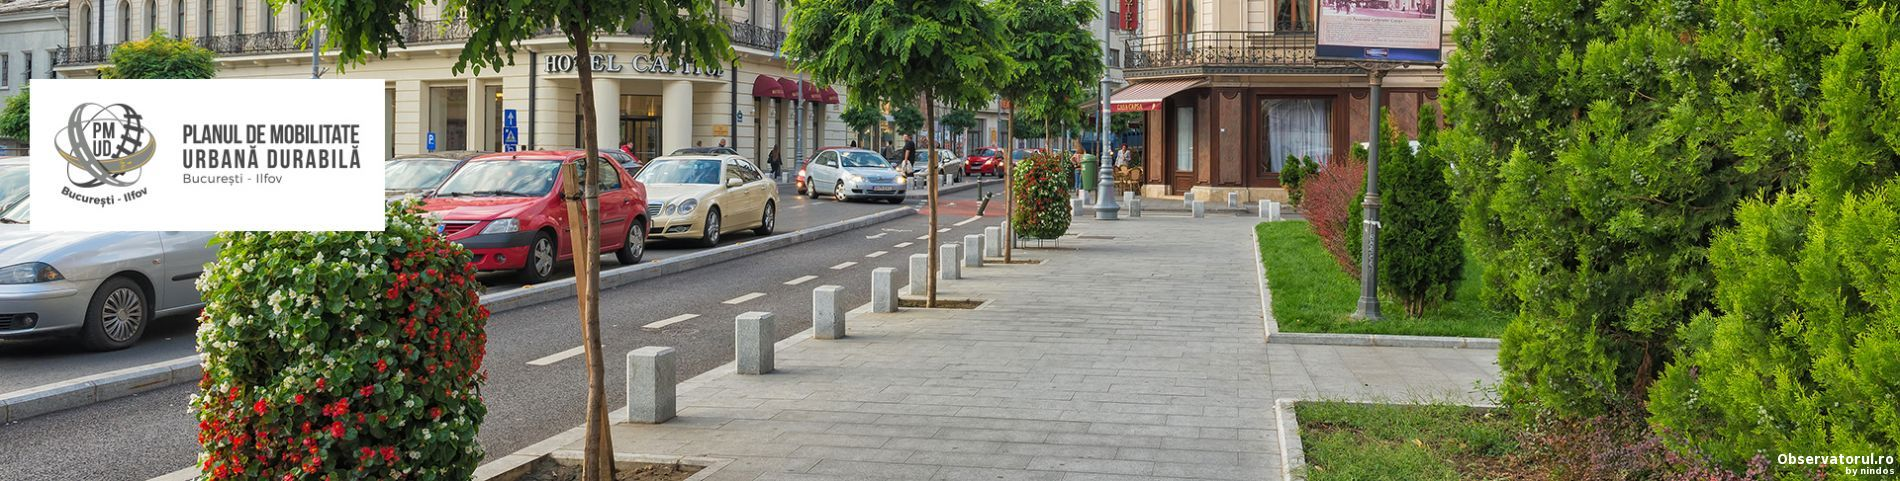 Planul de Mobilitate Urbana Durabila, dezbatere publica